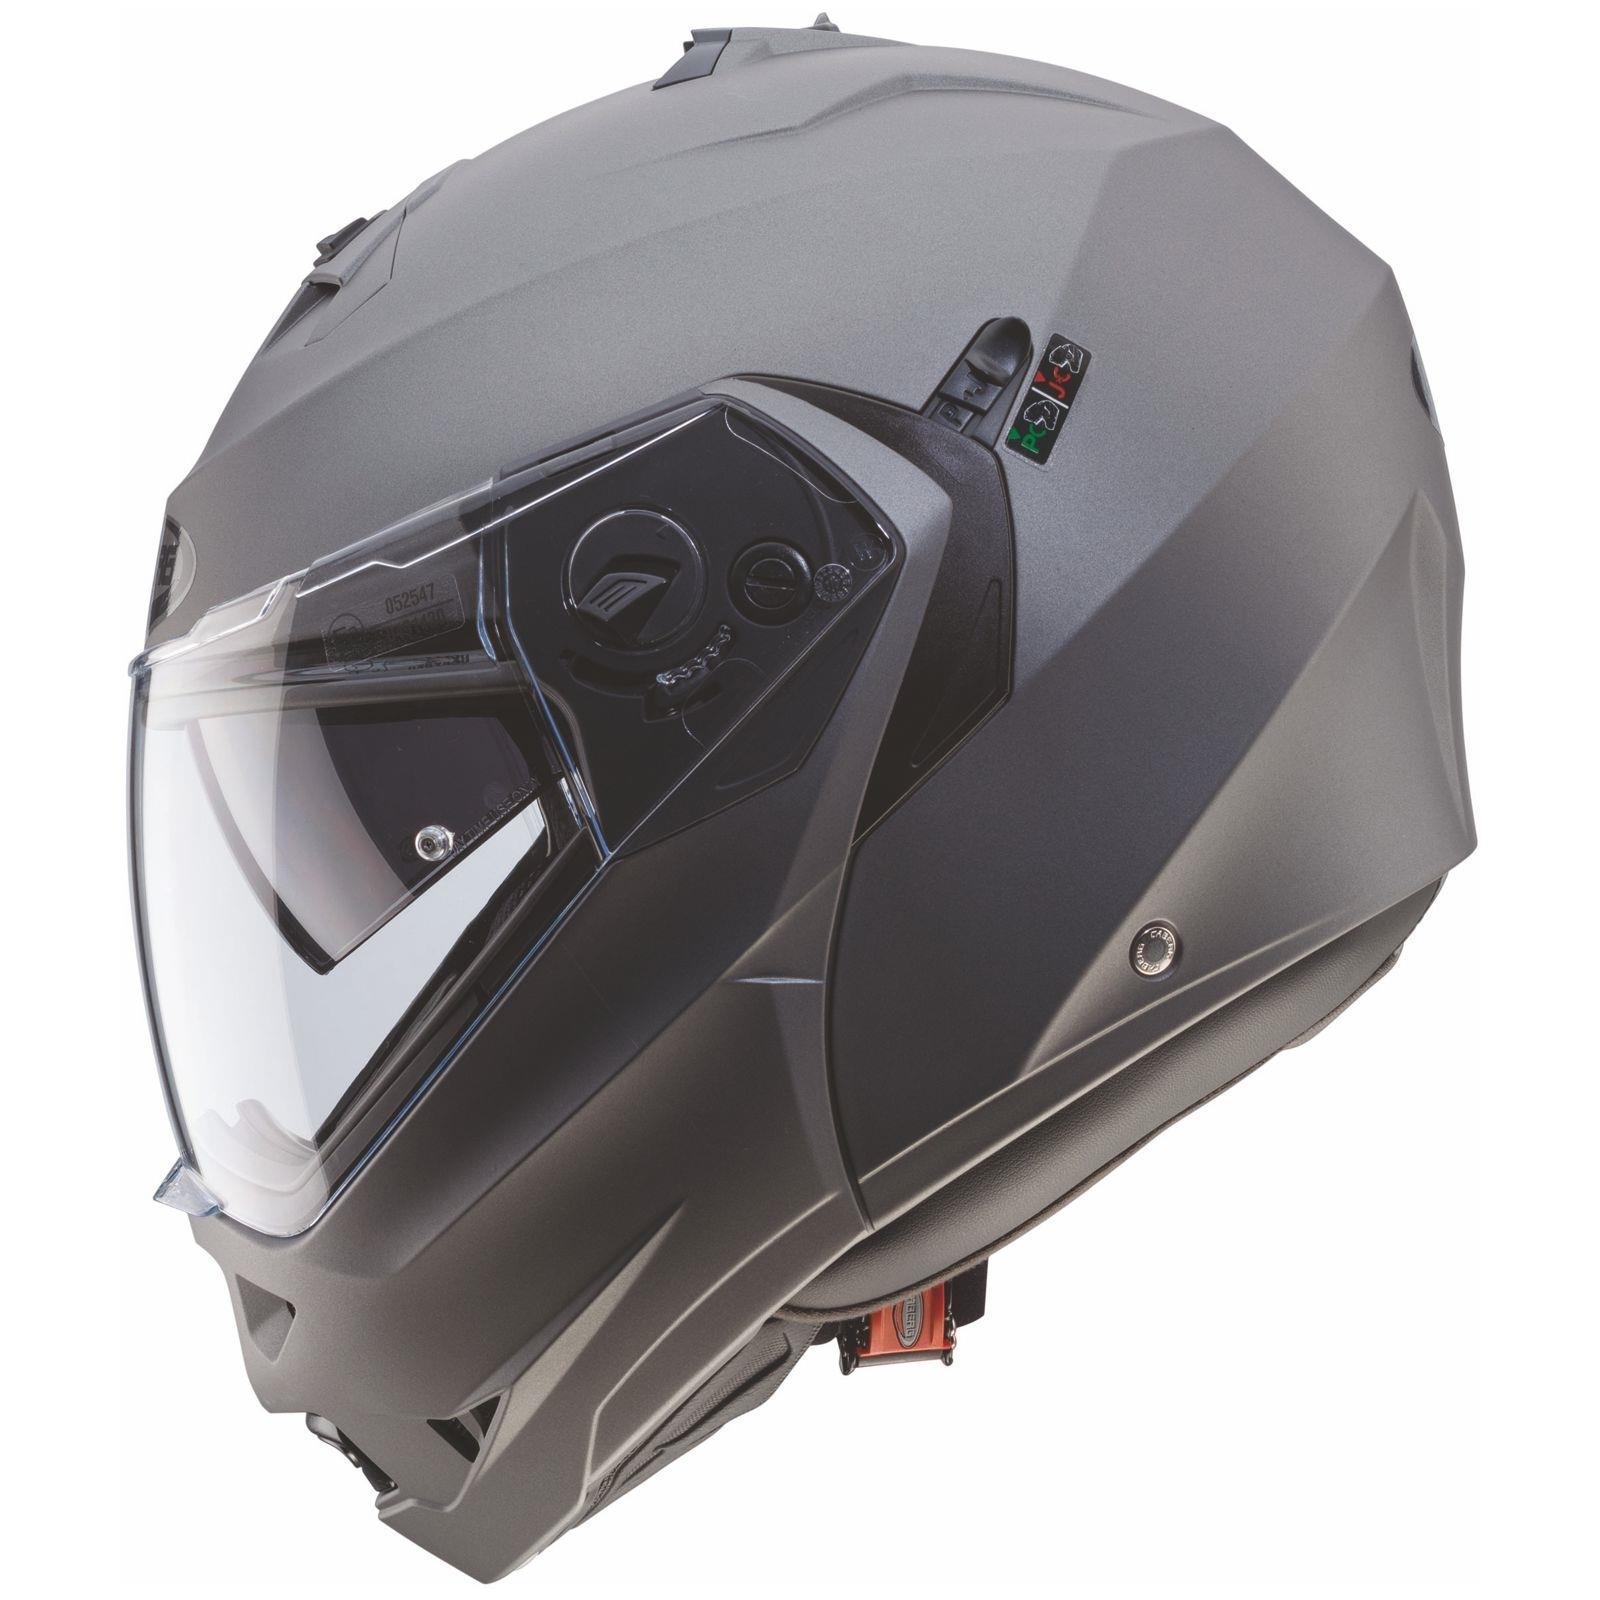 Caberg-Klapp-Helm-Duke-II-2-Motorrad-Belueftet-Sonnenblende-Pinlock-Visier-Jet Indexbild 19